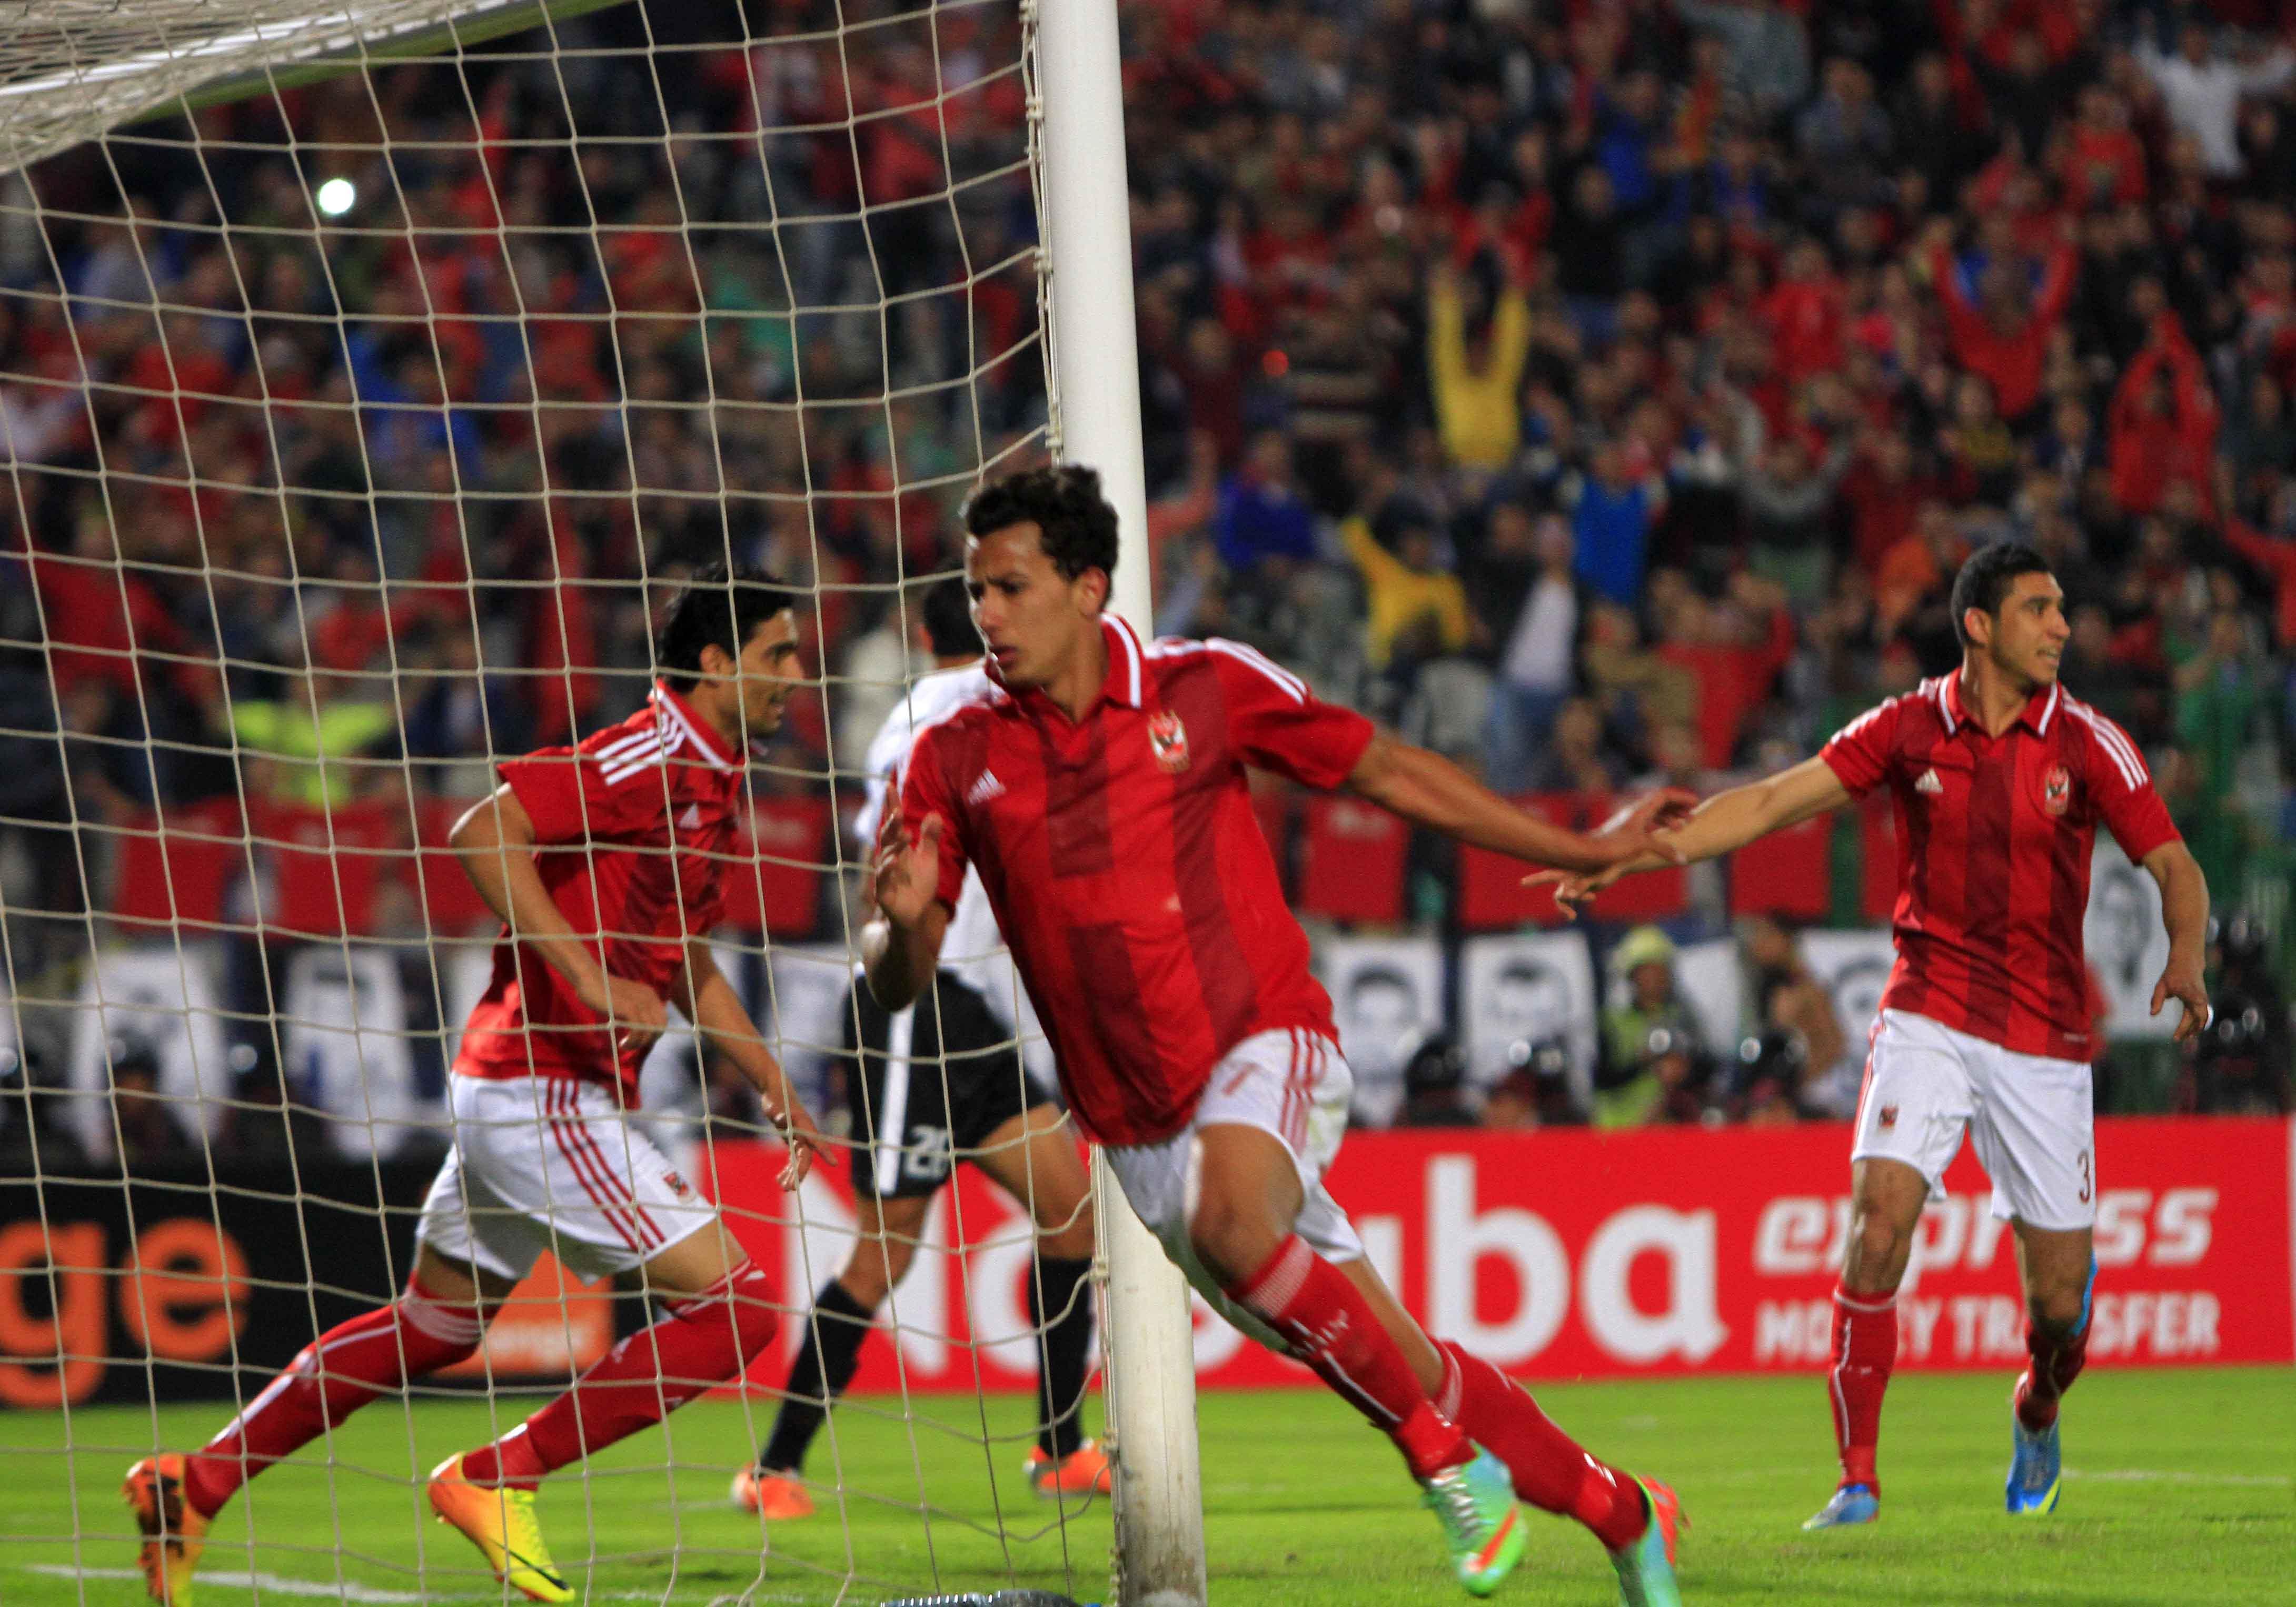 Amr gamal - Ahli - Sfaxien - African Super Cup